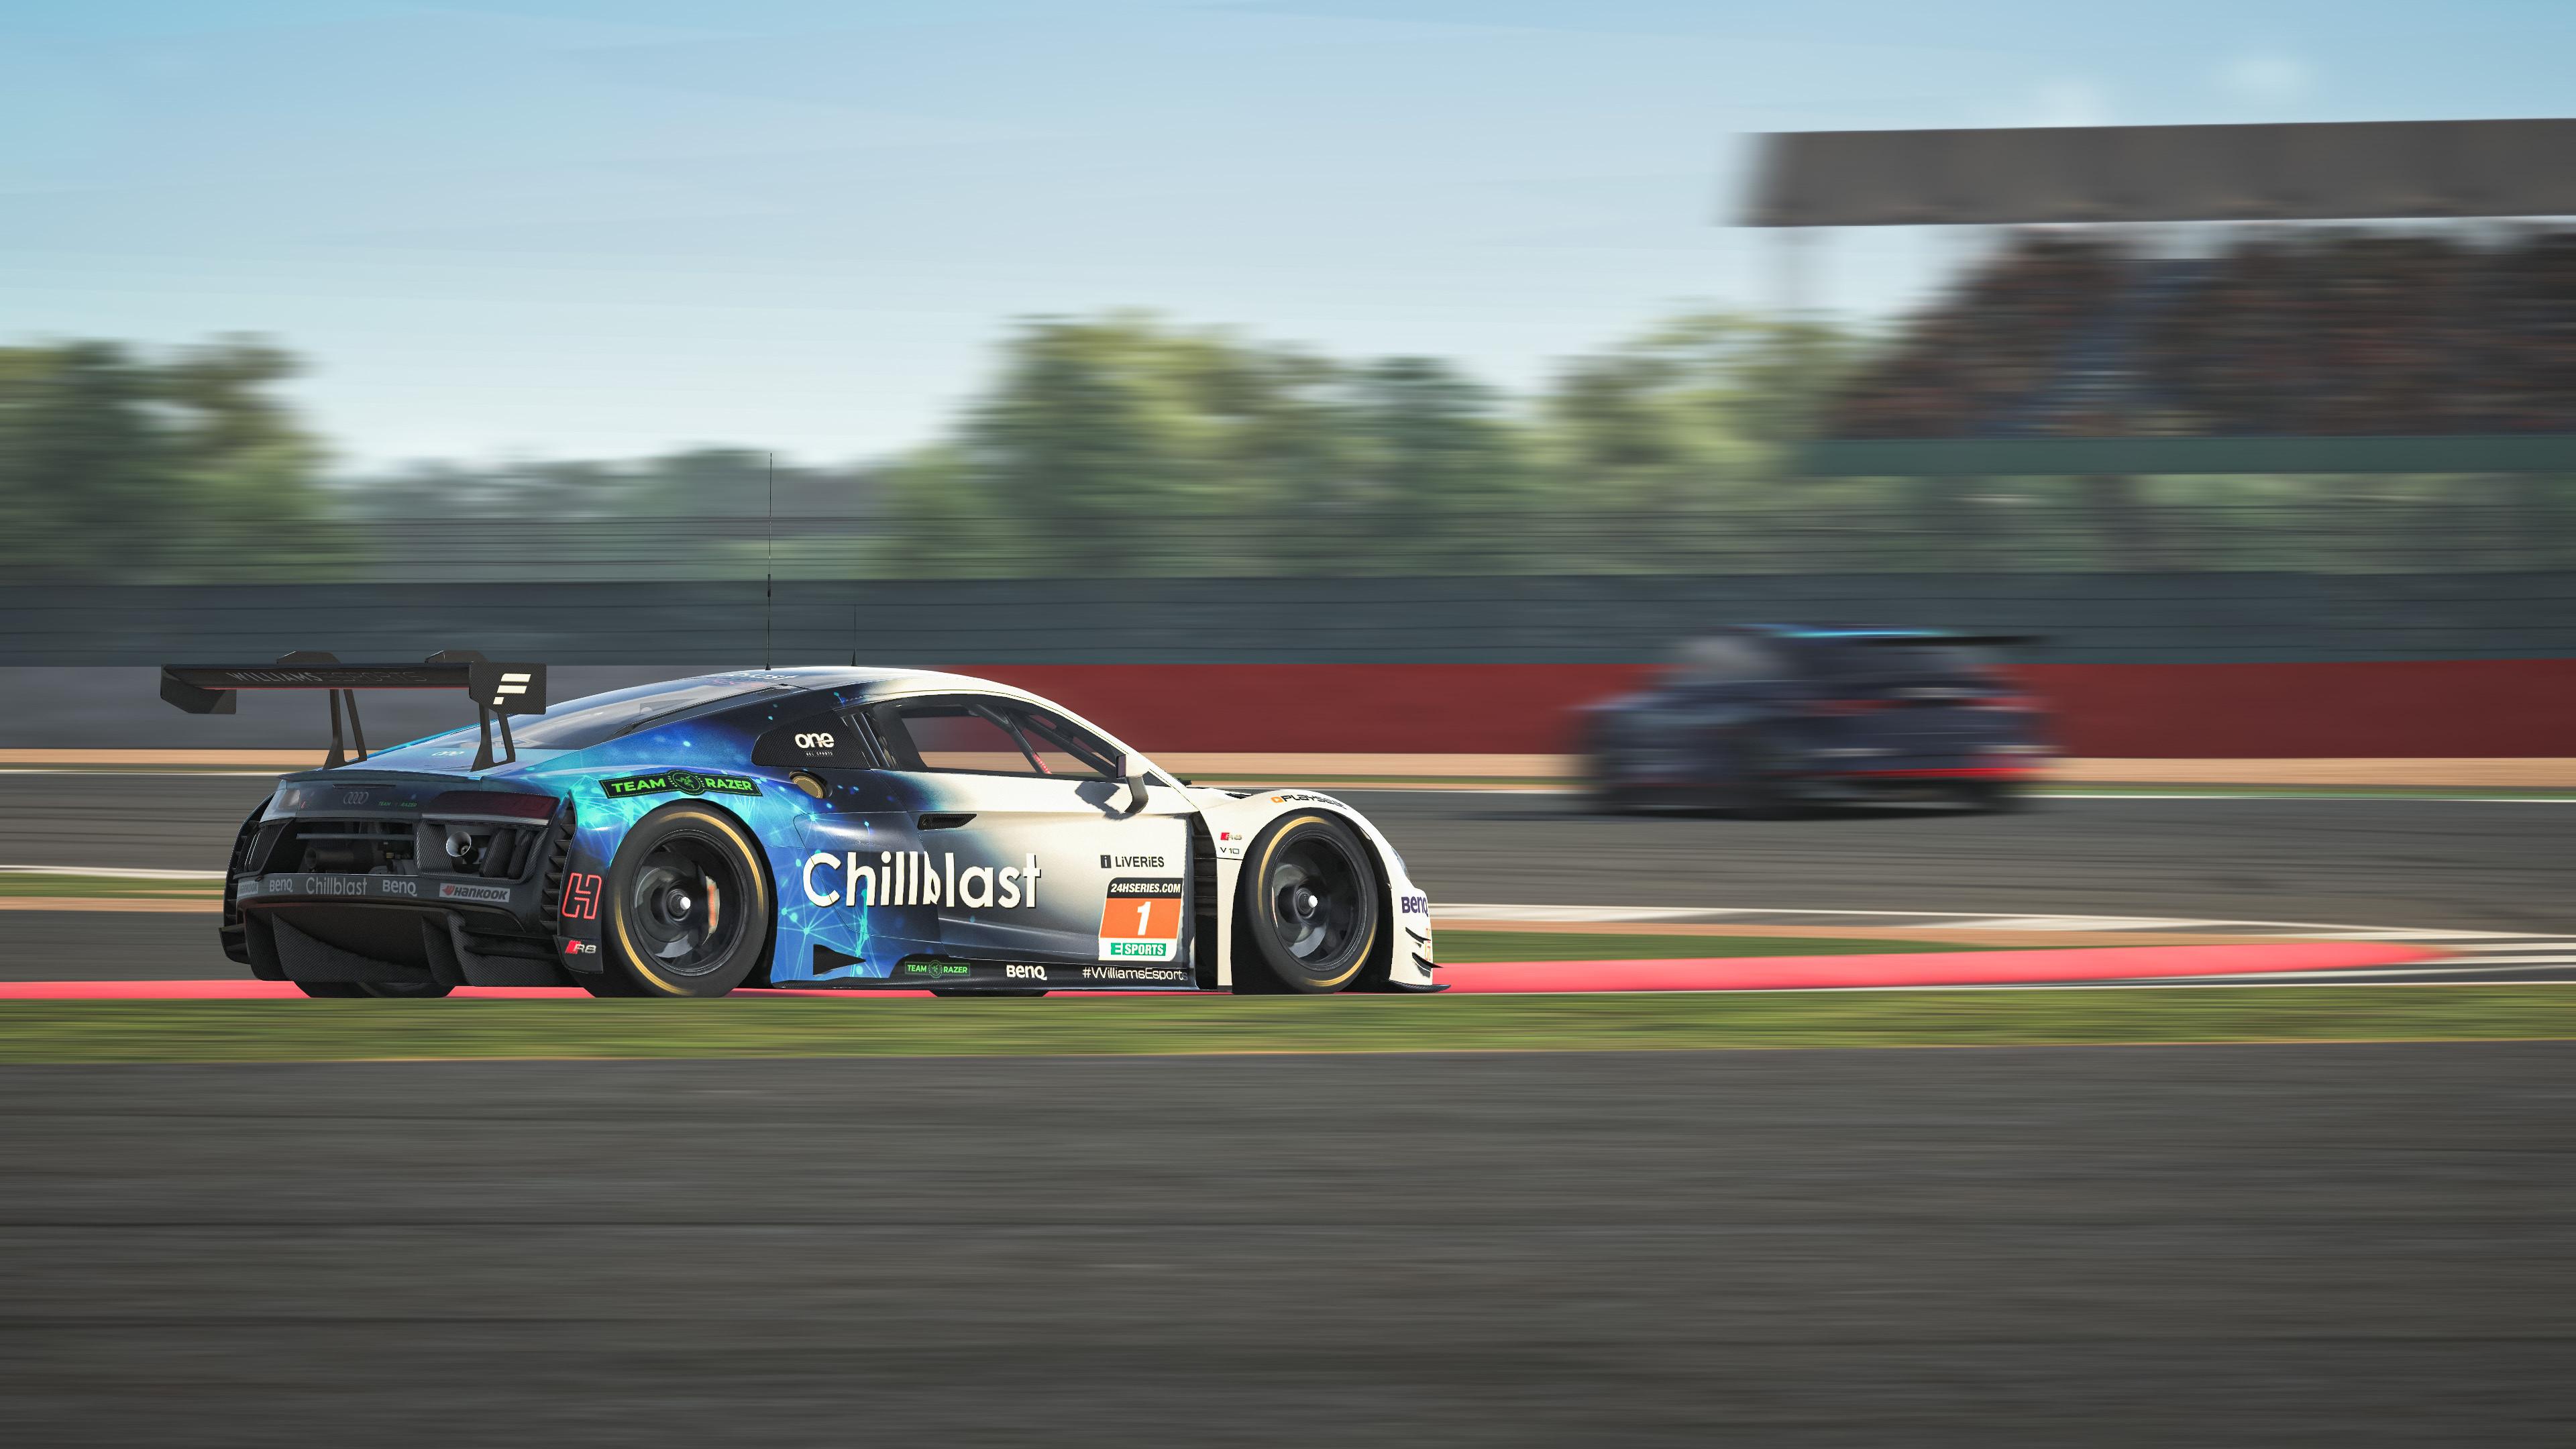 An image of an Audi GT car cornering hard.